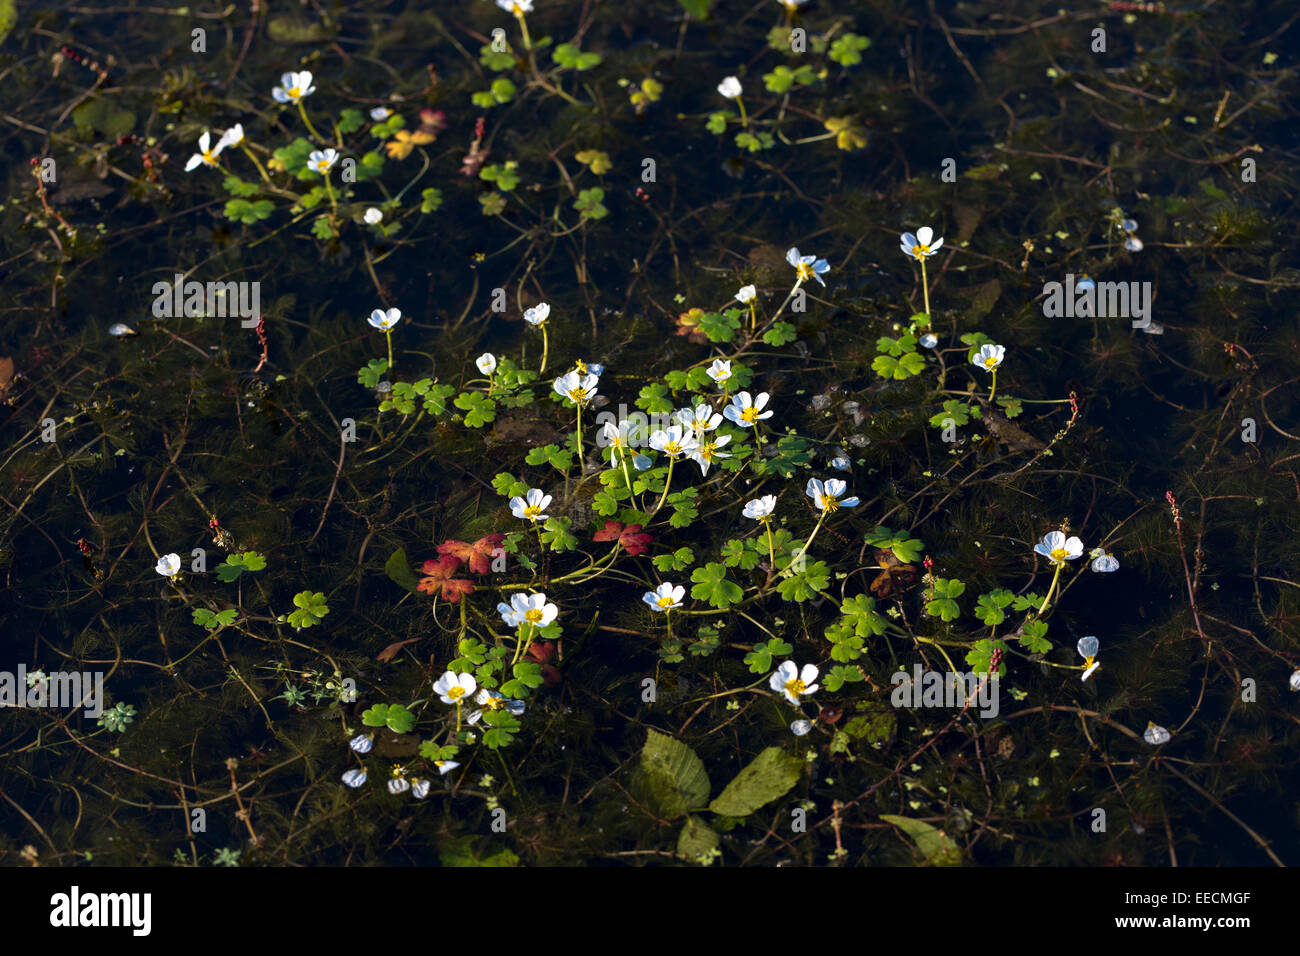 Mehrjährige krautige Wildblumen in Hecke in England Stockbild